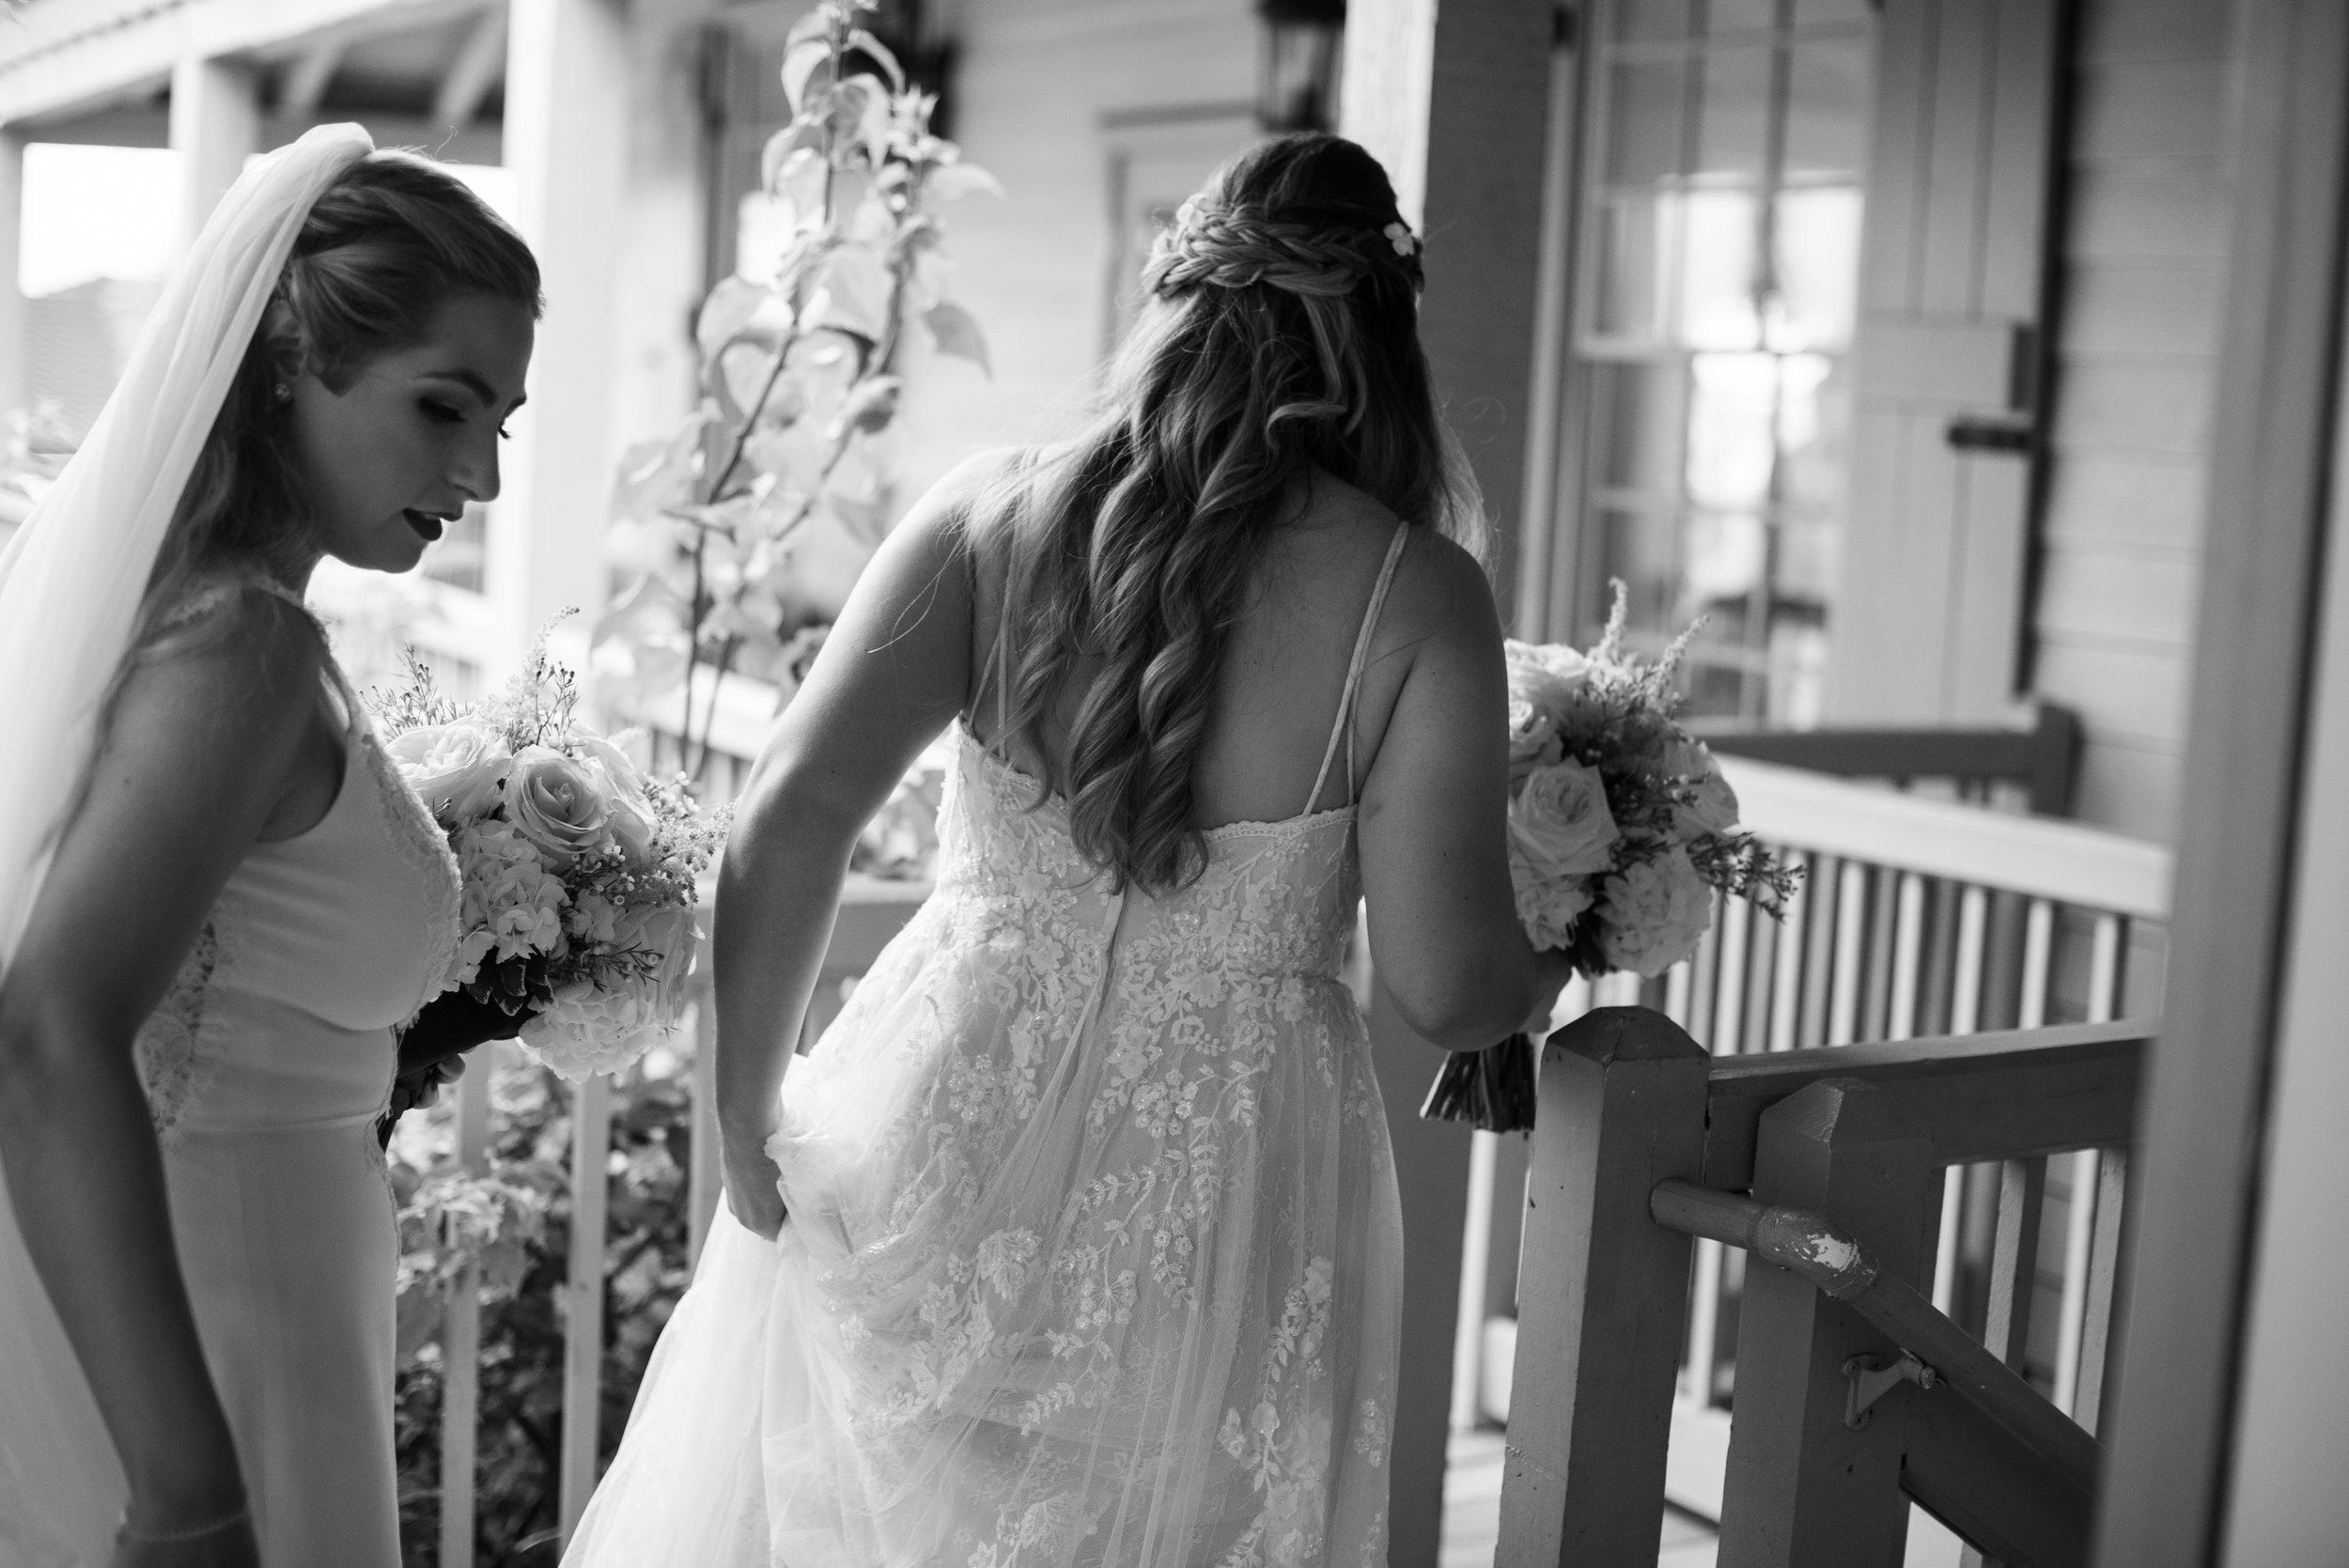 st-augustine-photographer-st-augustine-gay-wedding-sam-sex-wedding-photographer-sarah-annay-photography-white-room-weddings-32.jpg